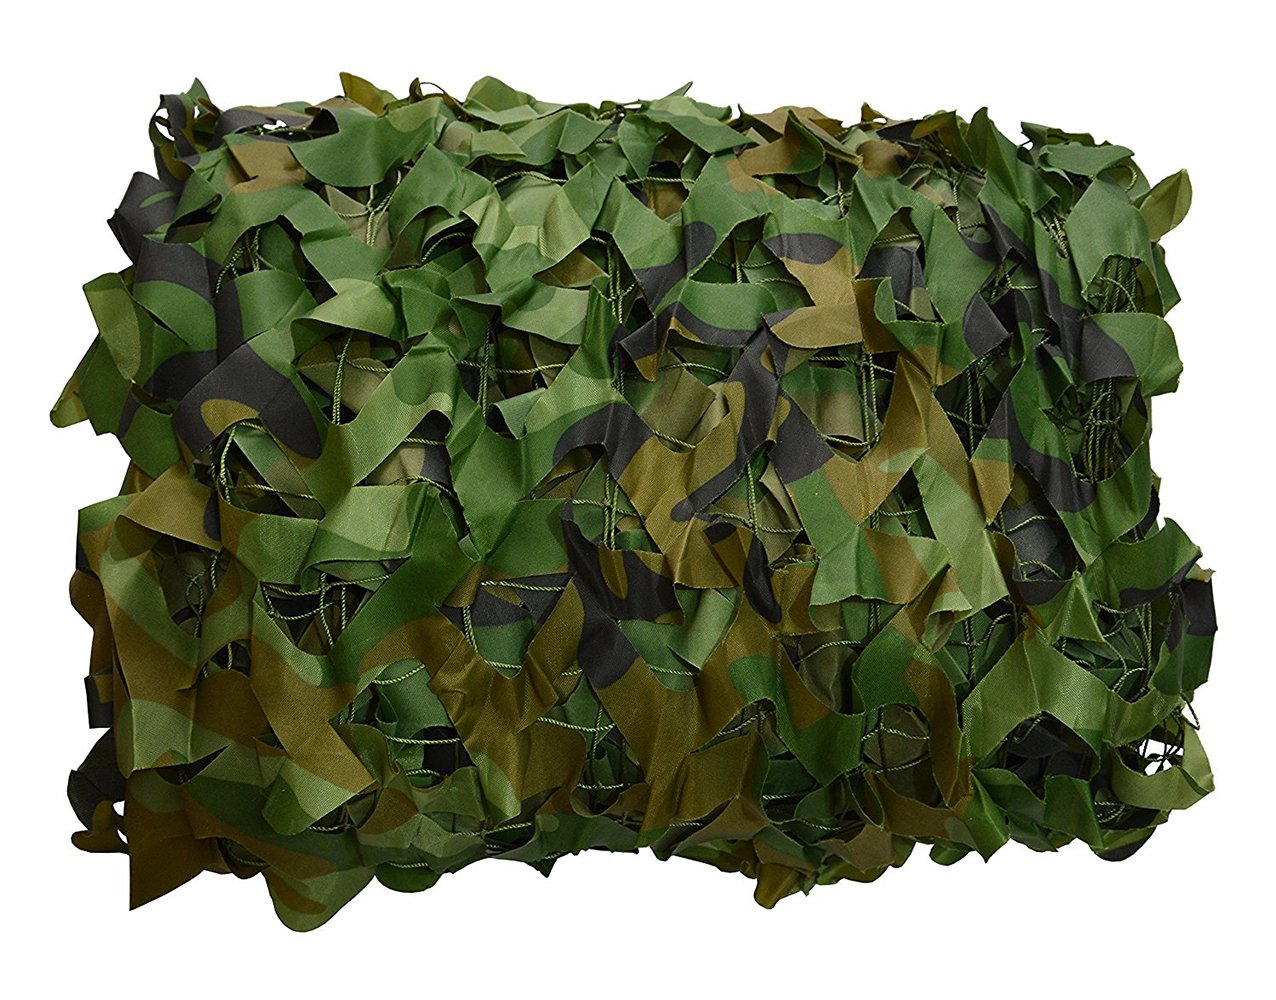 Size 3m x 3m Camouflage Netting Woodland Jungle Camo Net Army Camo Net New